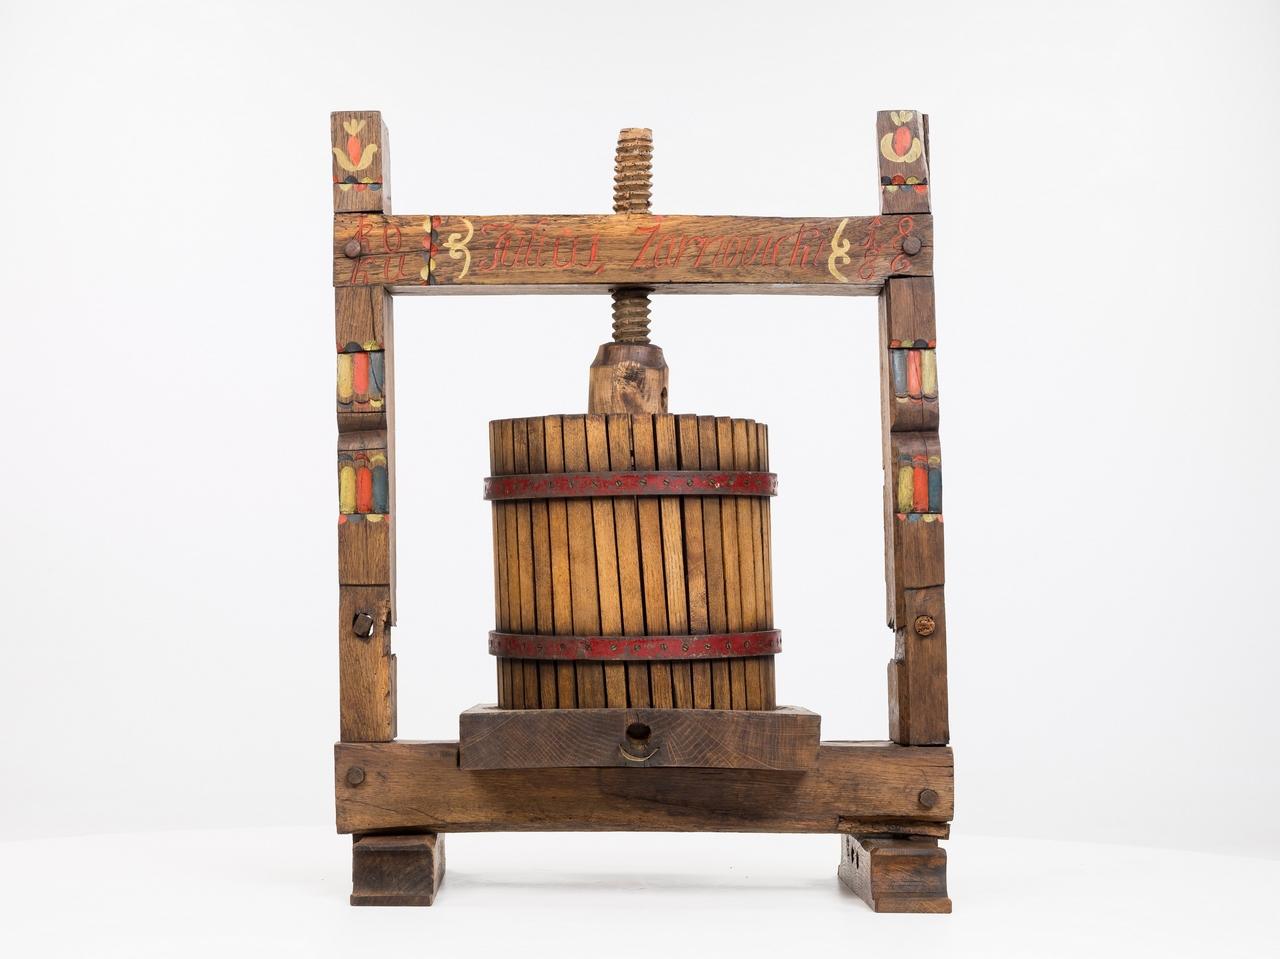 Vretenový vinohradnícky lis z roku 1886 - Spindel-Weinpresse von 1886